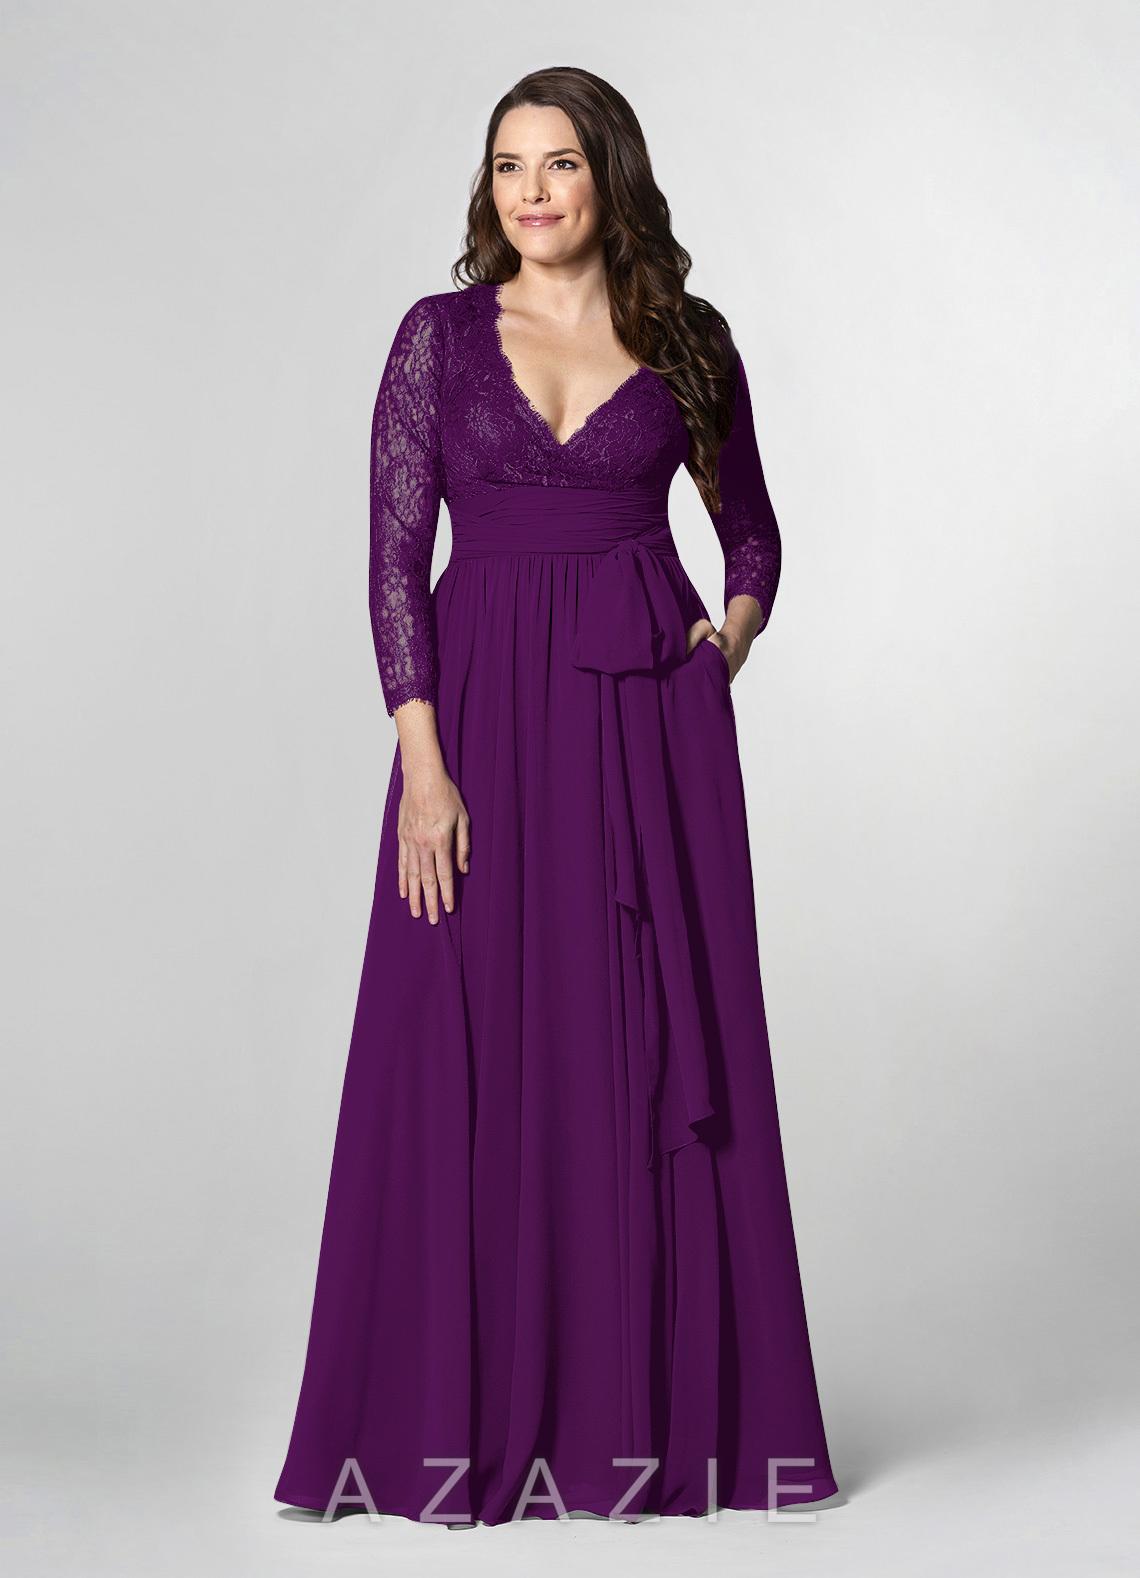 7e81d53e9e Azazie Keaton MBD Mother Of The Bride Dress | Azazie